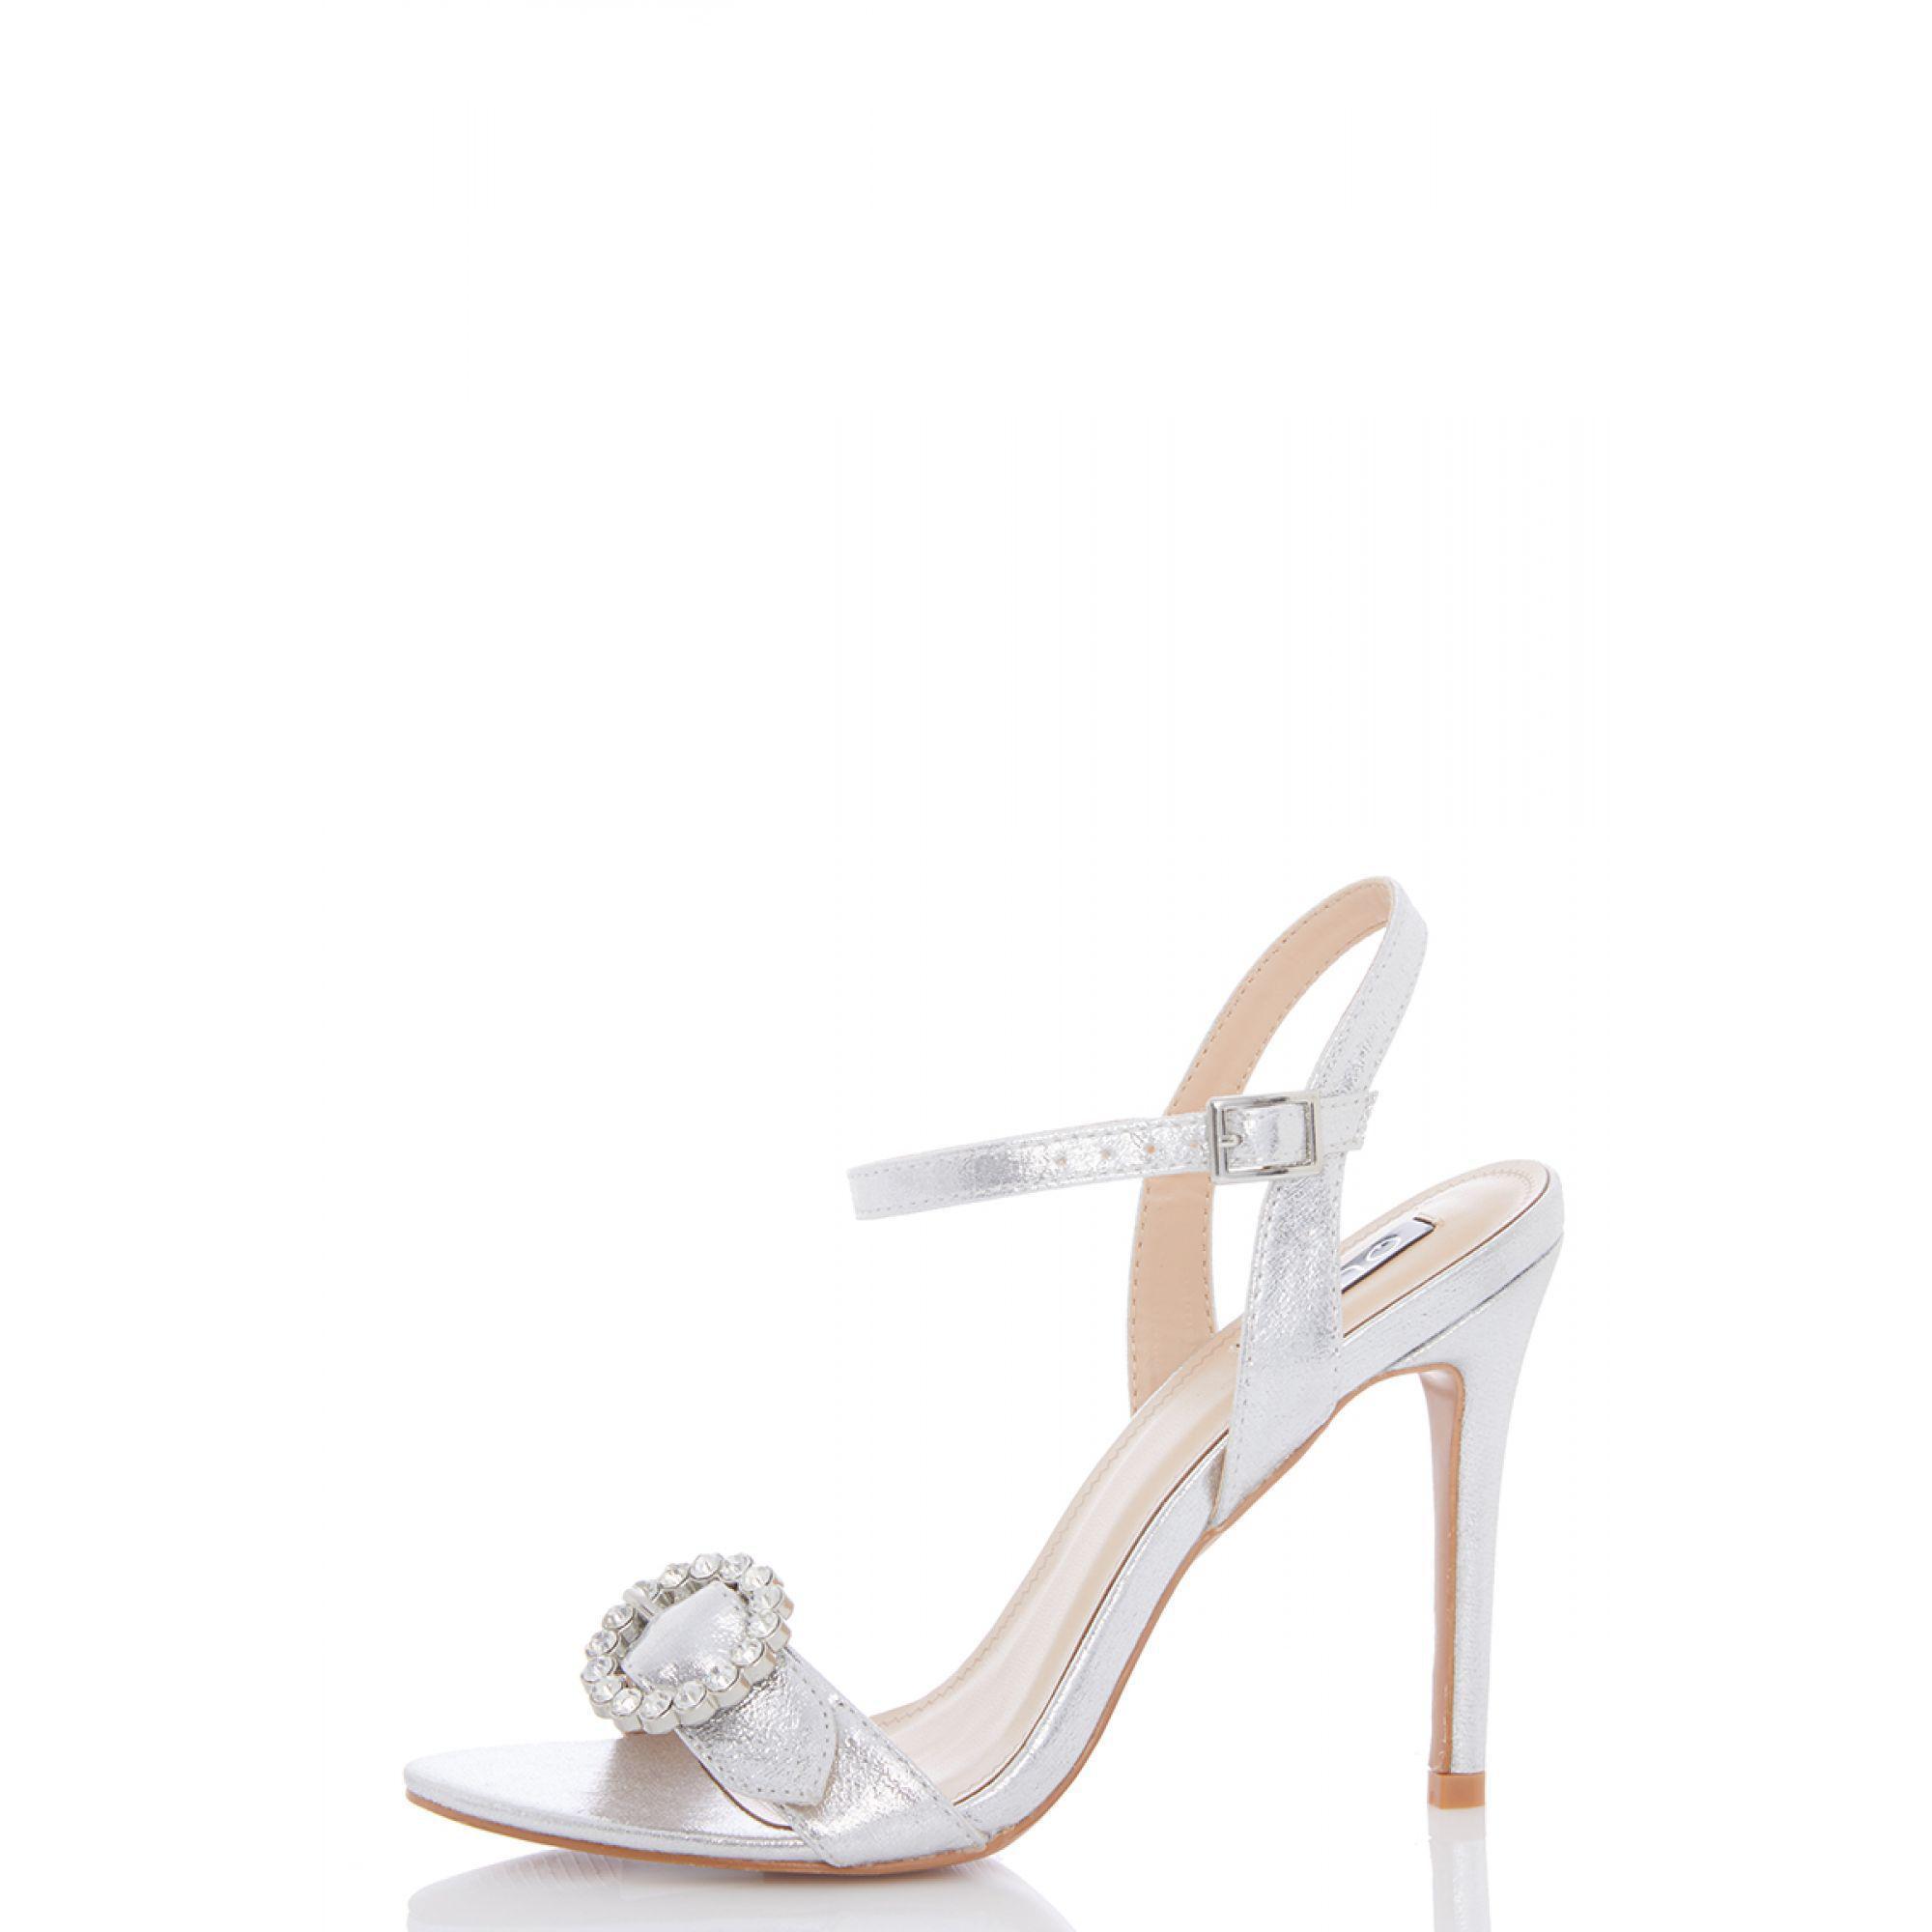 8145f507a13 Quiz Silver Shimmer Jewel Bucke Heel Sandals in Metallic - Lyst